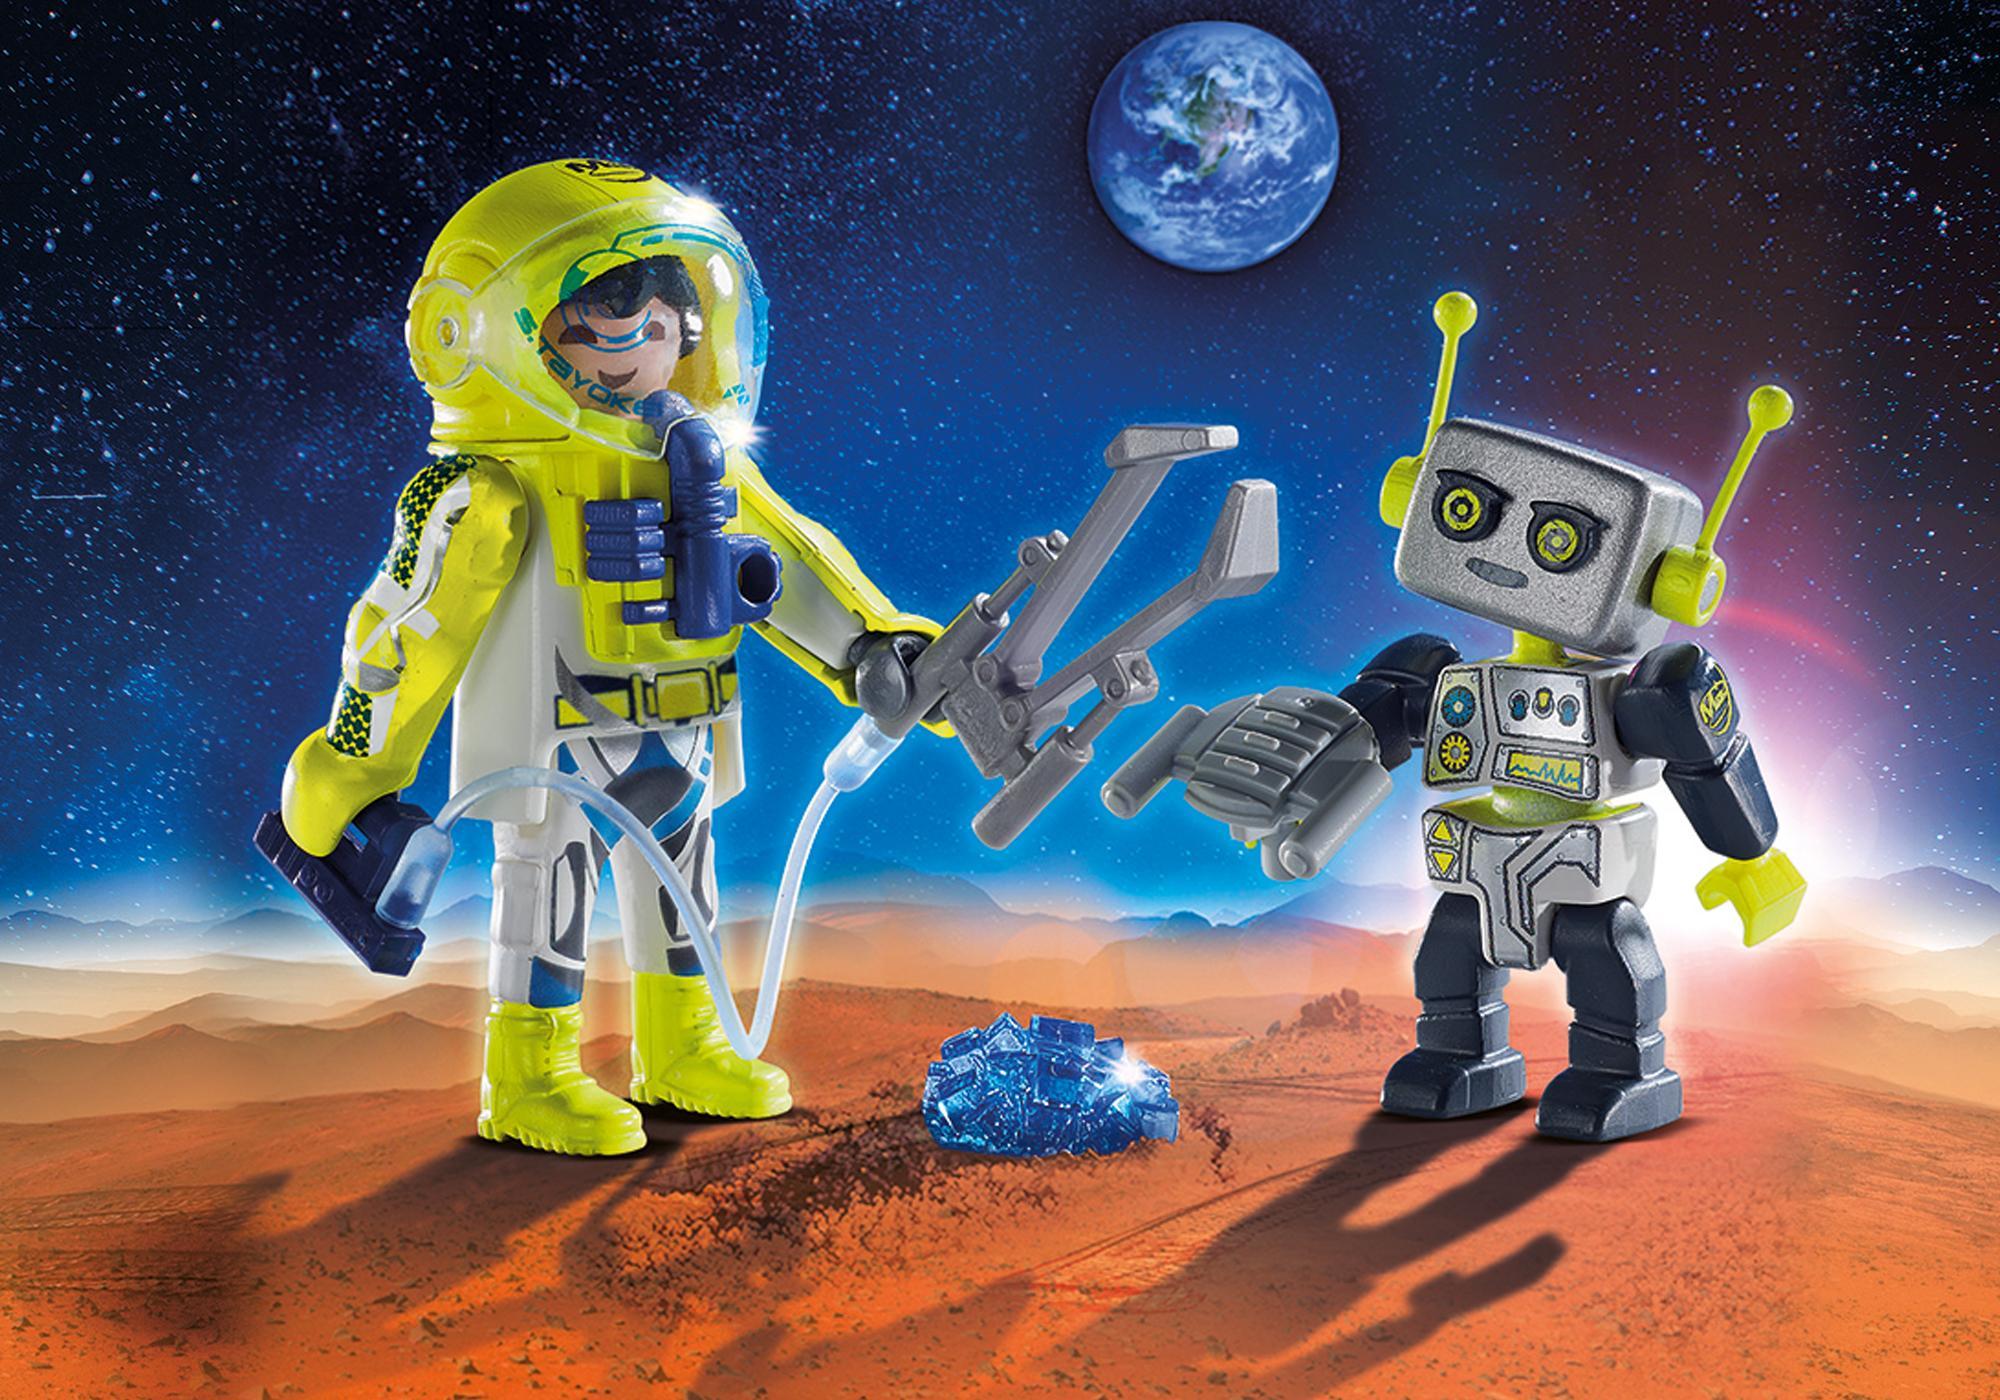 http://media.playmobil.com/i/playmobil/9492_product_detail/Astronaut and Robot Duo Pack